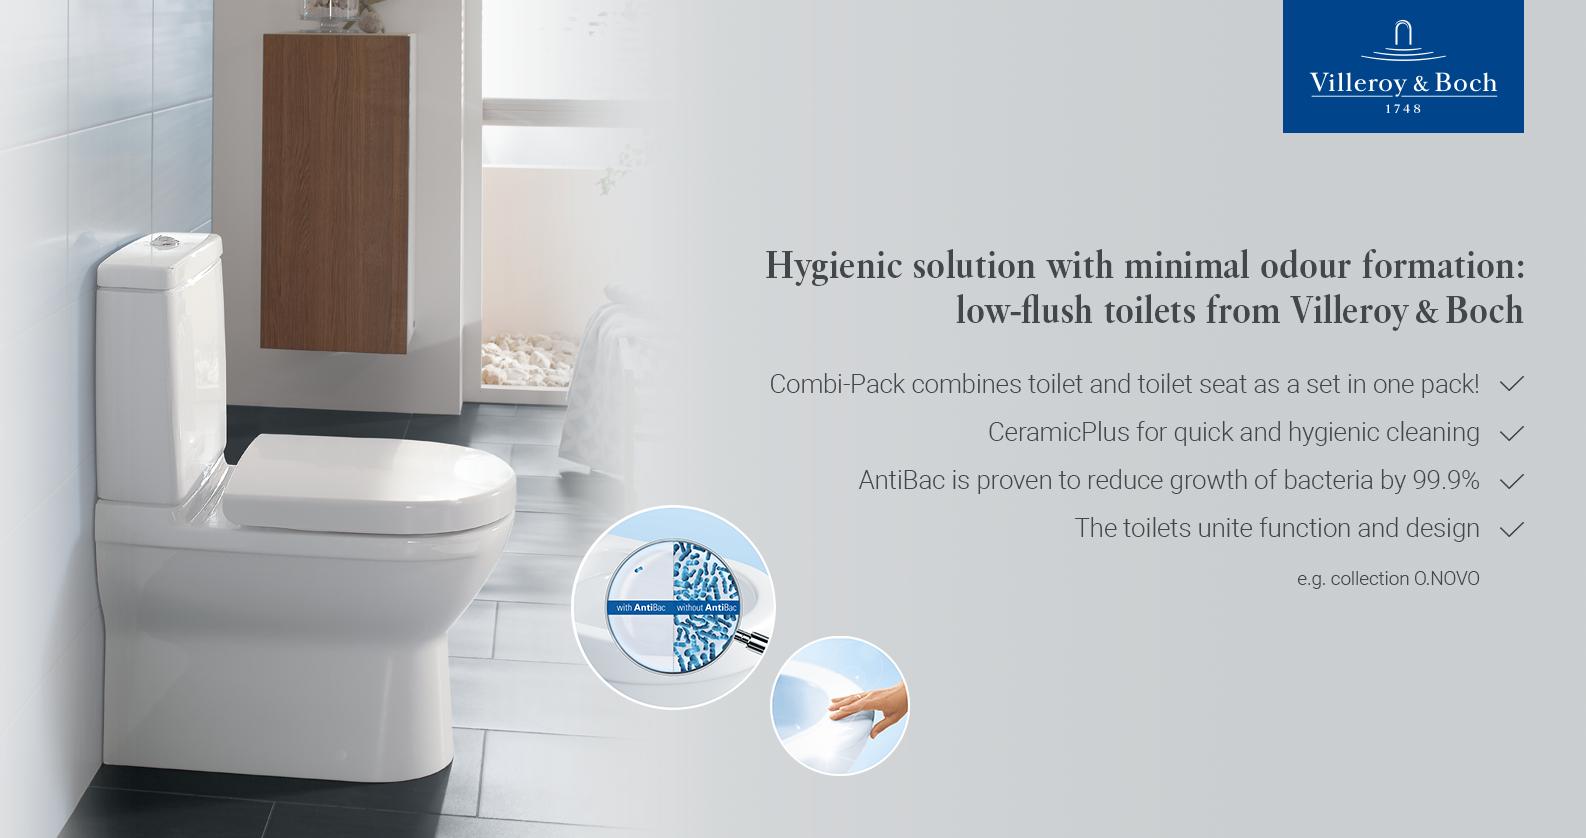 Villeroy & Boch O.Novo Toilets at xTWOstore